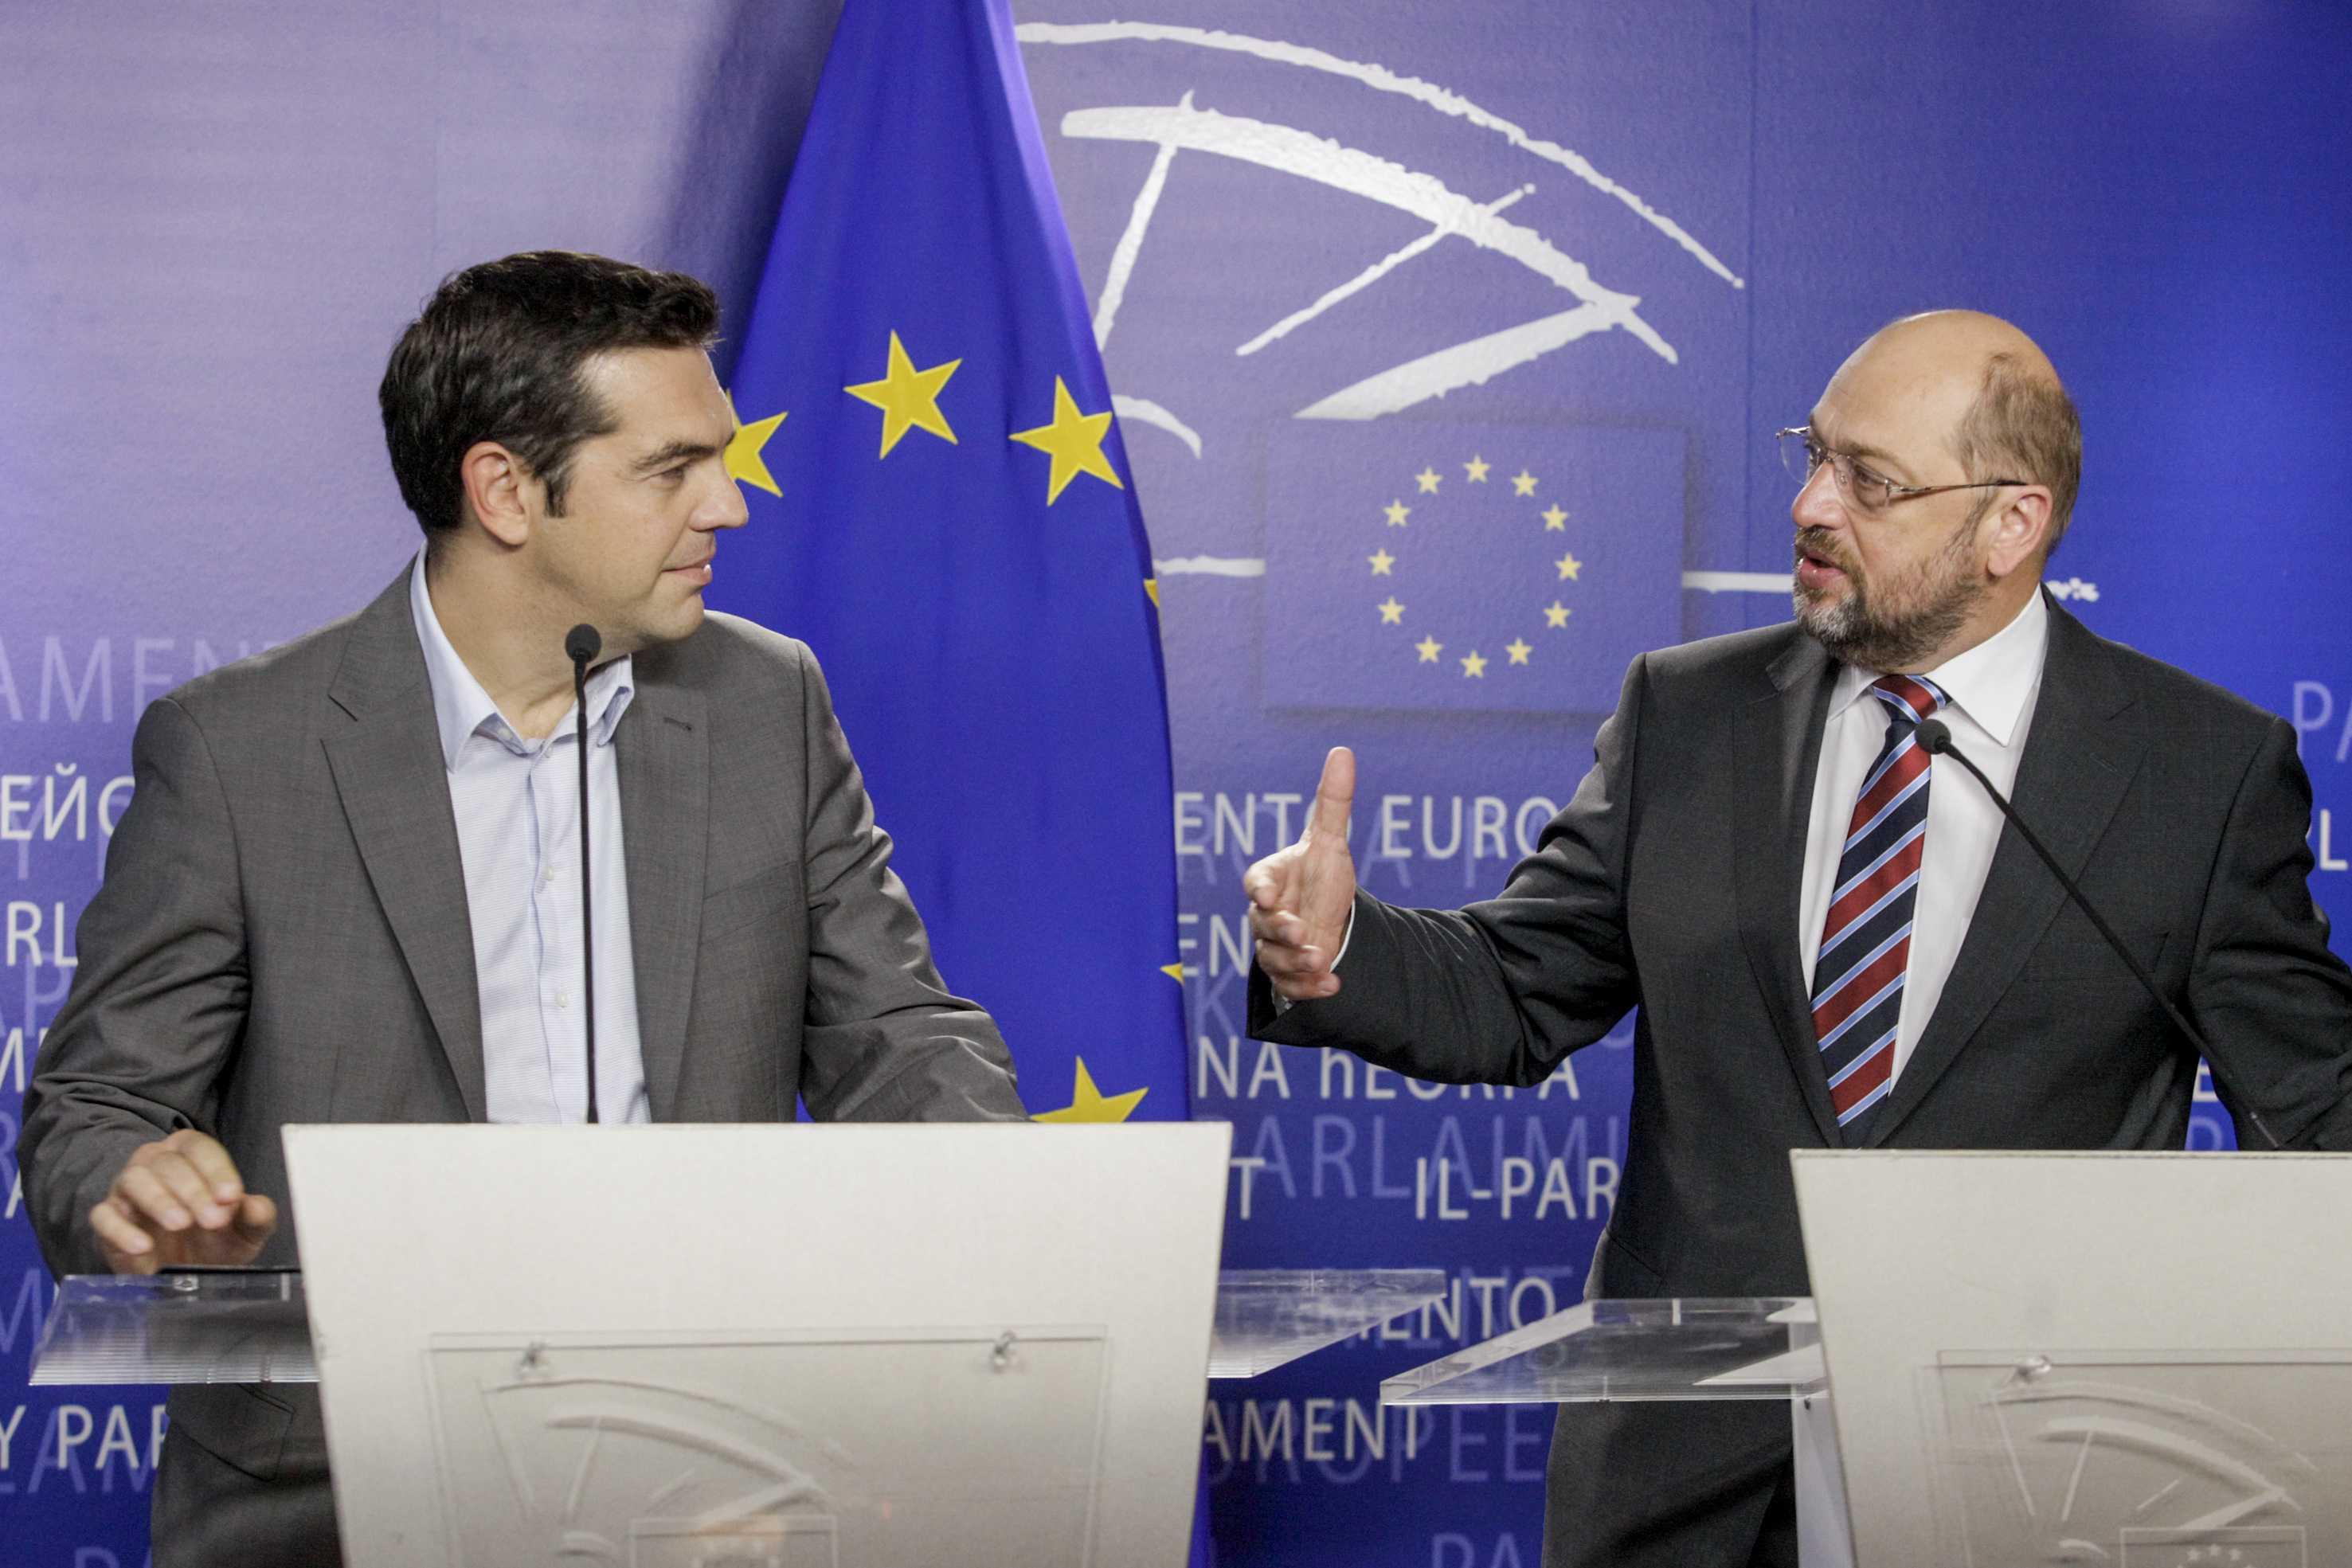 "SYRIZA – legaturi cu SOROS? ""STANGA RADICALA"" VREA UNIUNE EUROPEANA SUPRASTATALA/ Noul guvern al Greciei si chestiunea rusa"